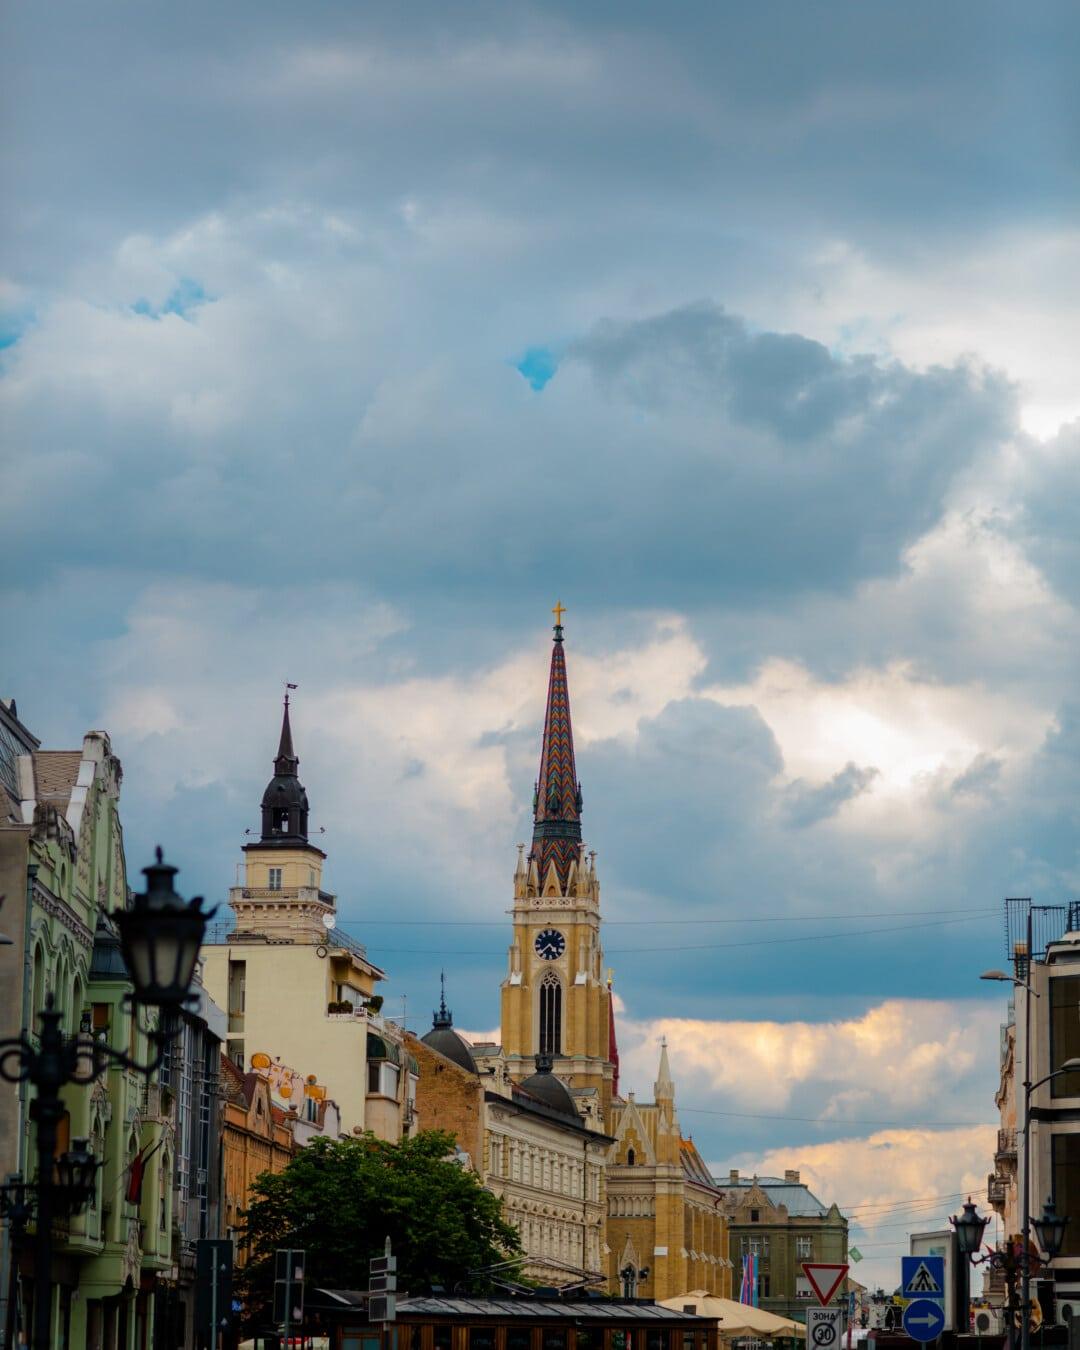 Panorama, Straße, Gebäude, Turm, kathedrale, Architektur, Religion, Kirche, alt, Stadt